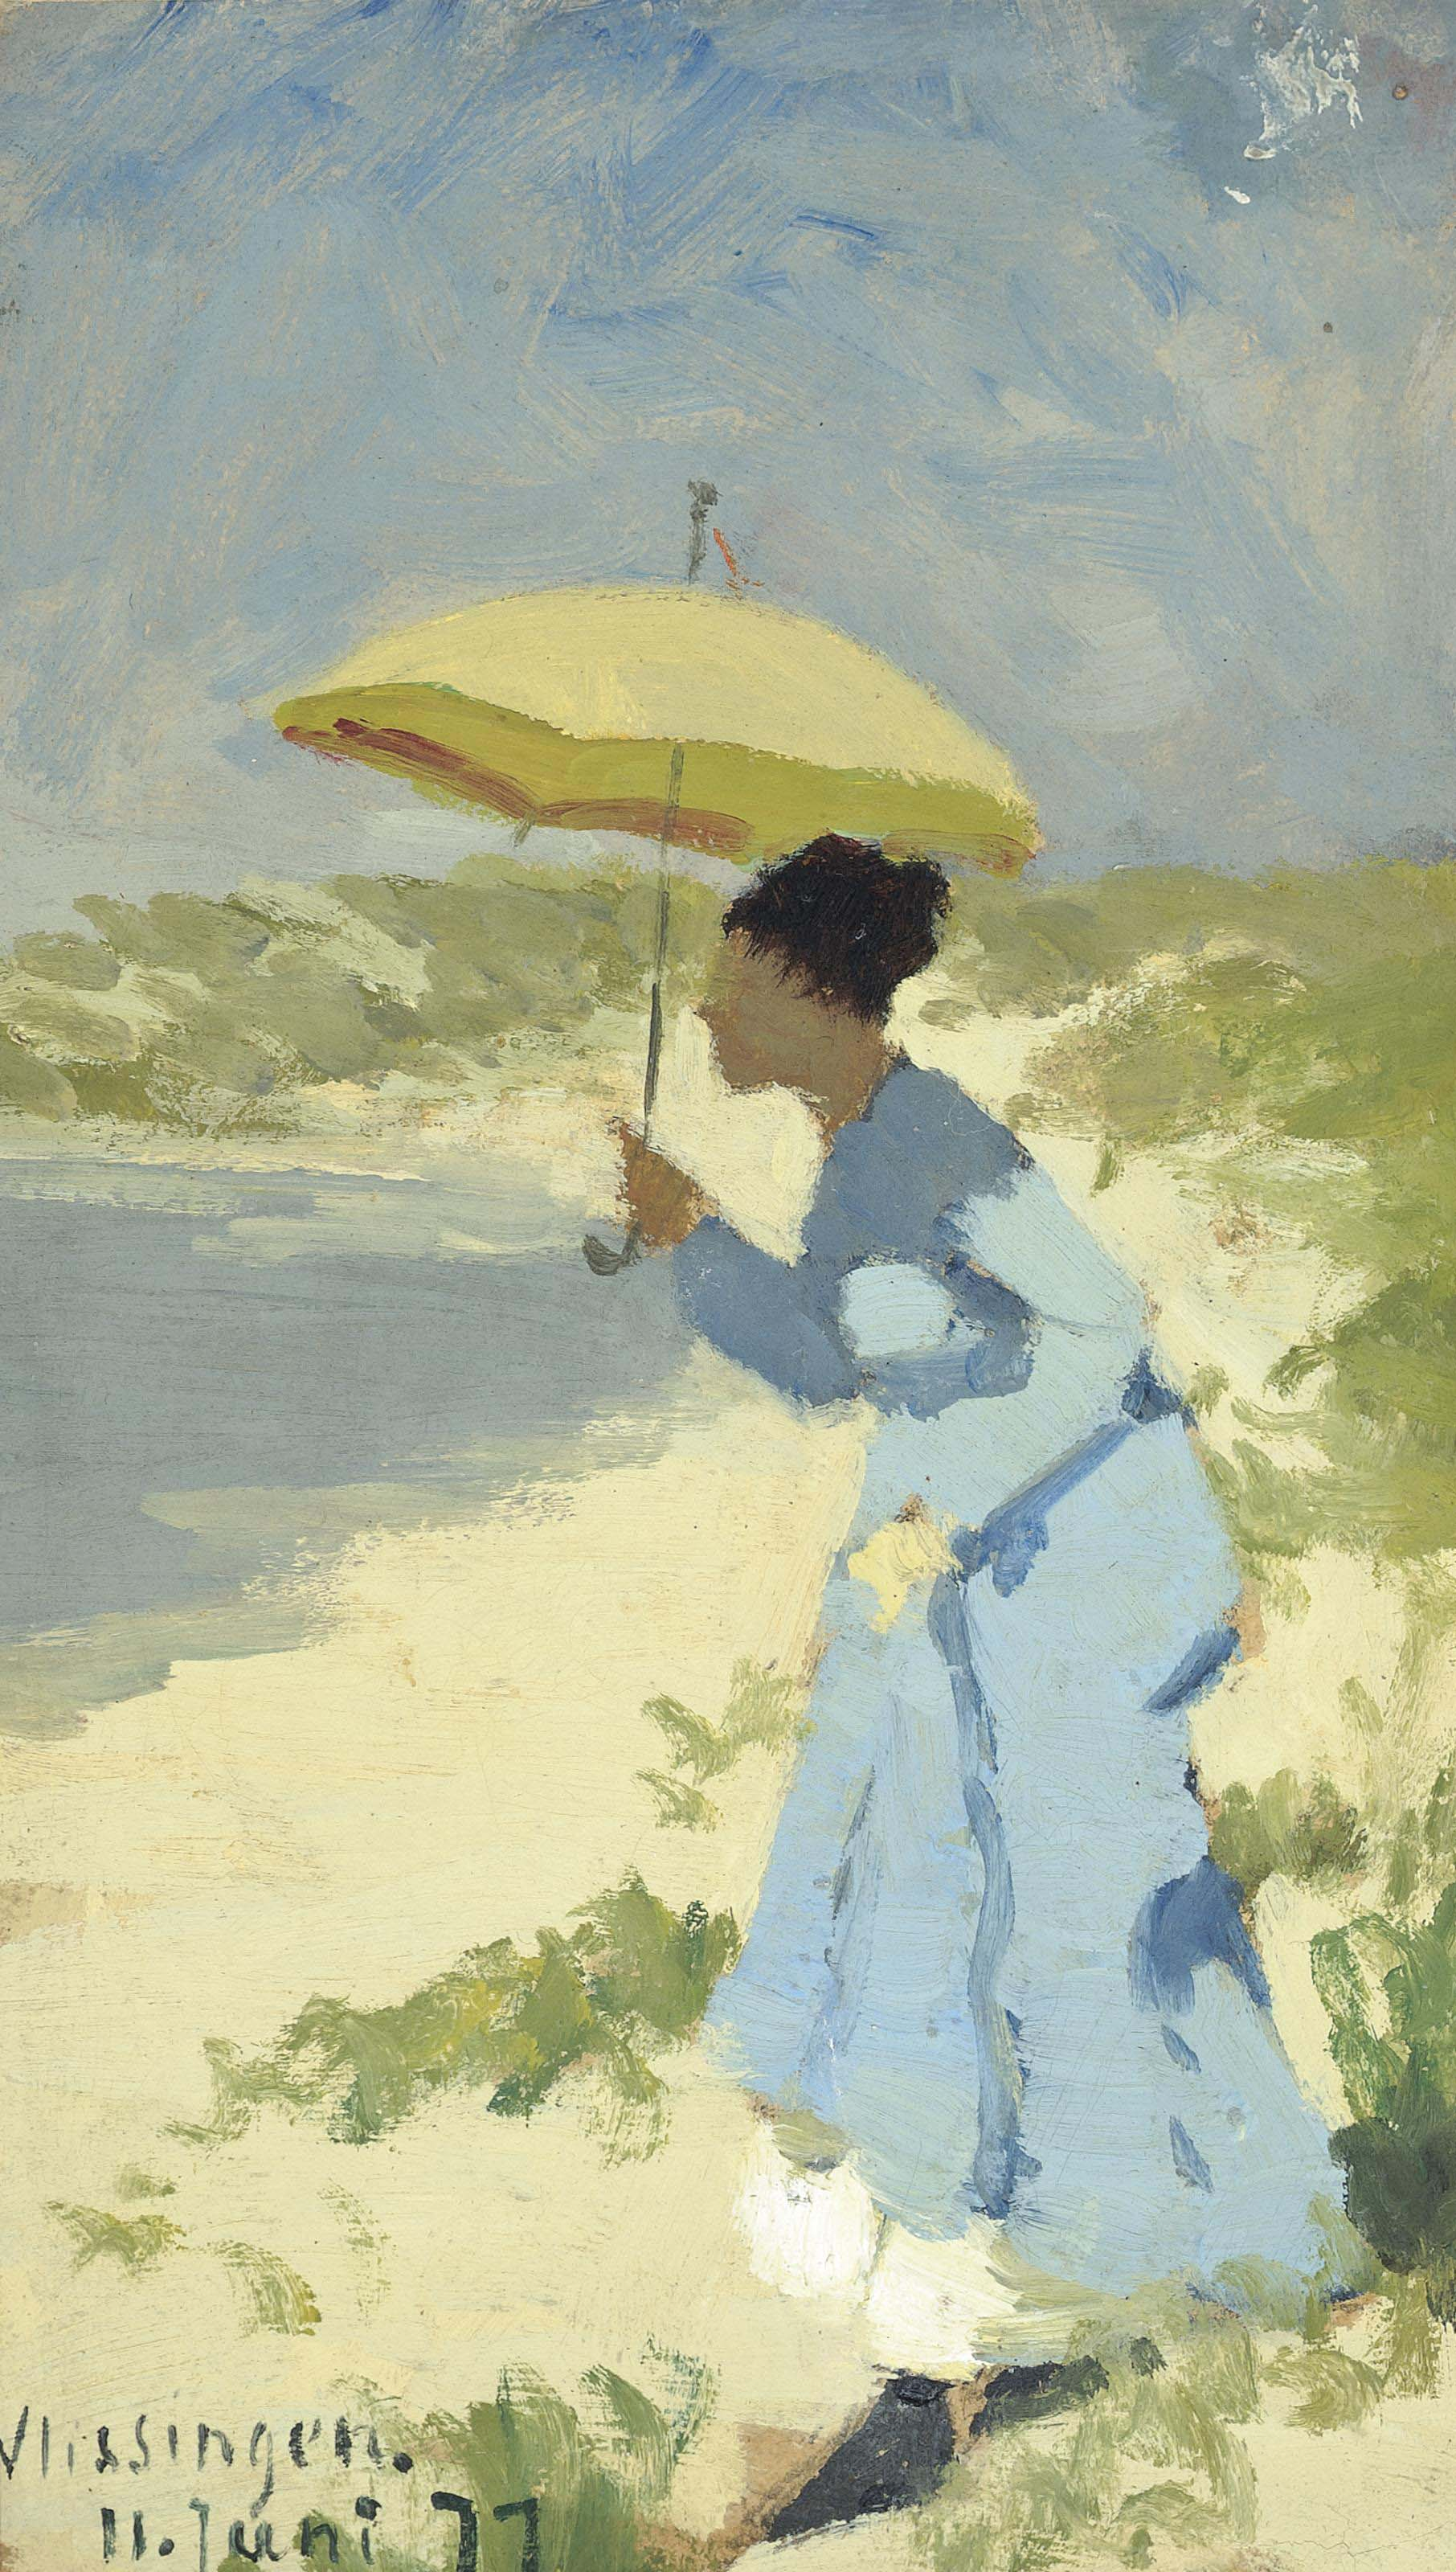 A lady on the beach under a parasol